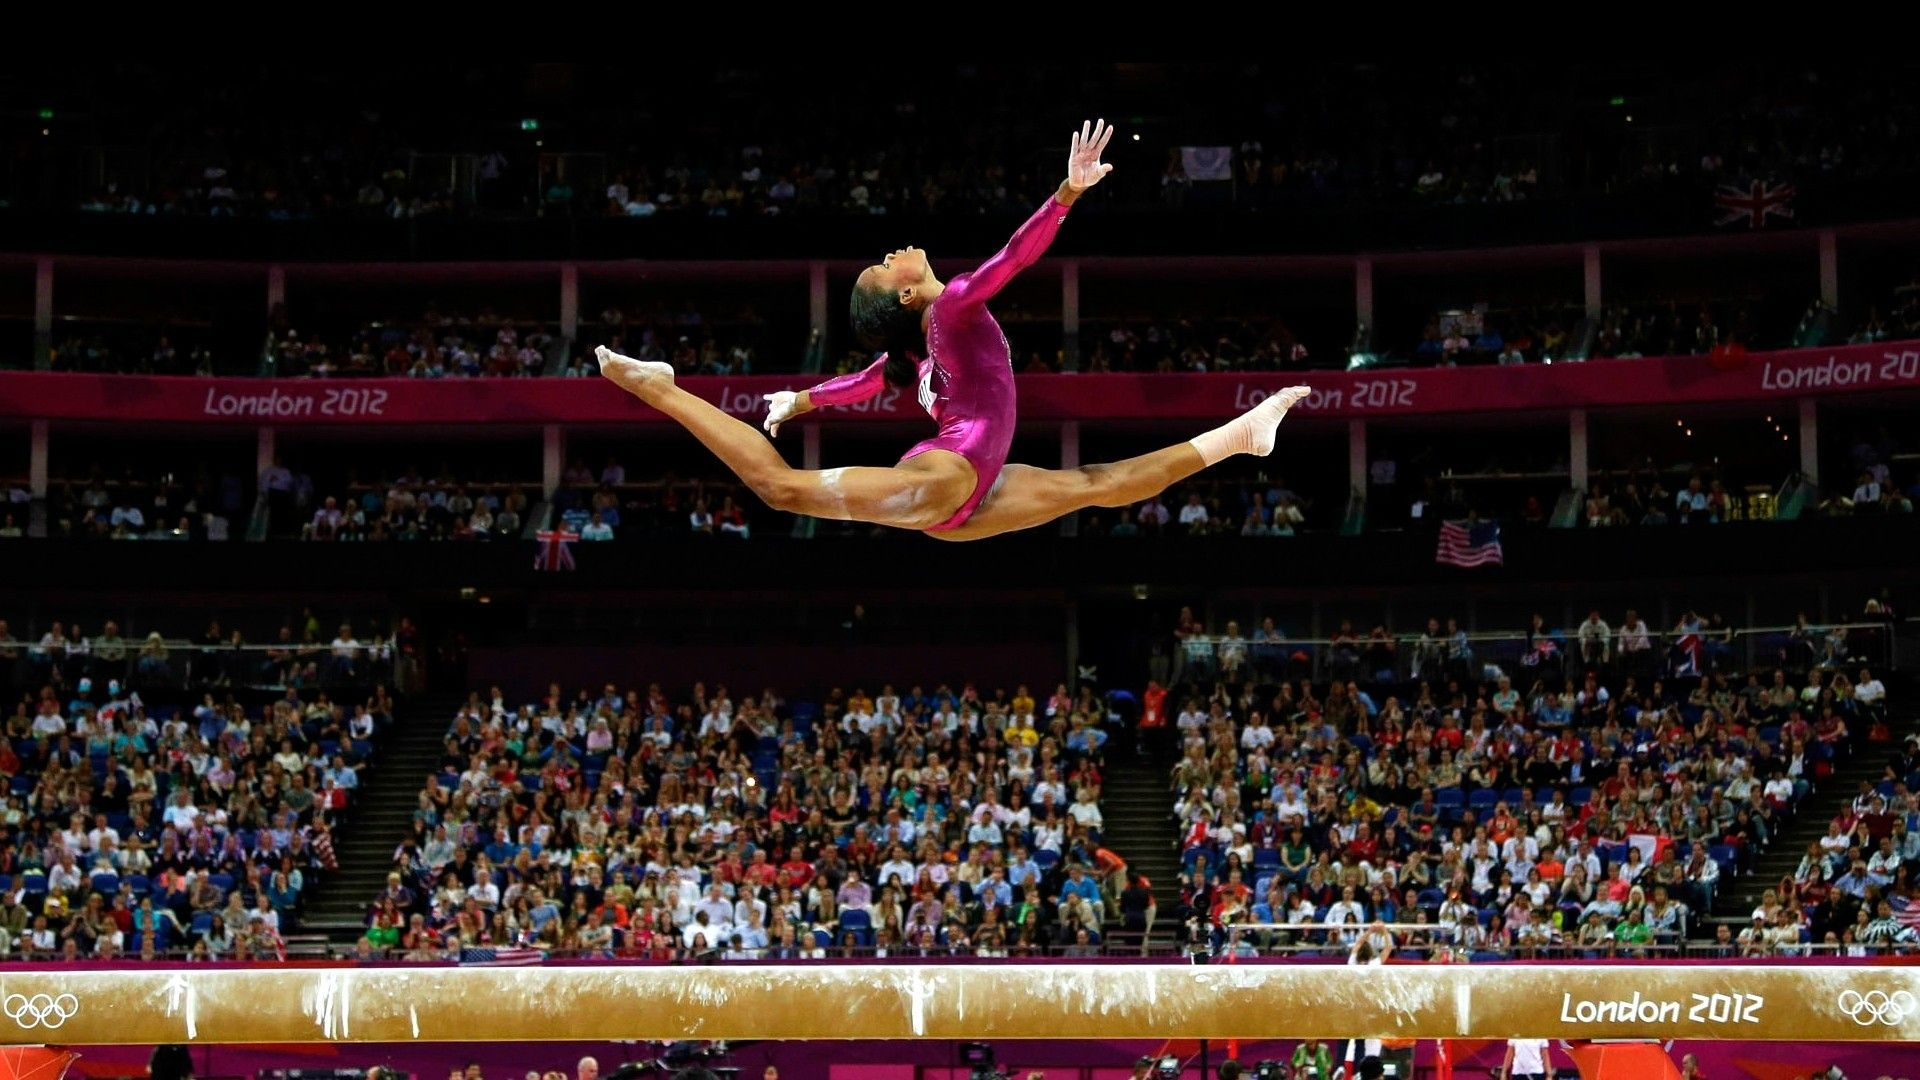 Balance beam gymnastics olympics 2012 gabrielle douglas ... Balance Beam Gymnastics Olympics